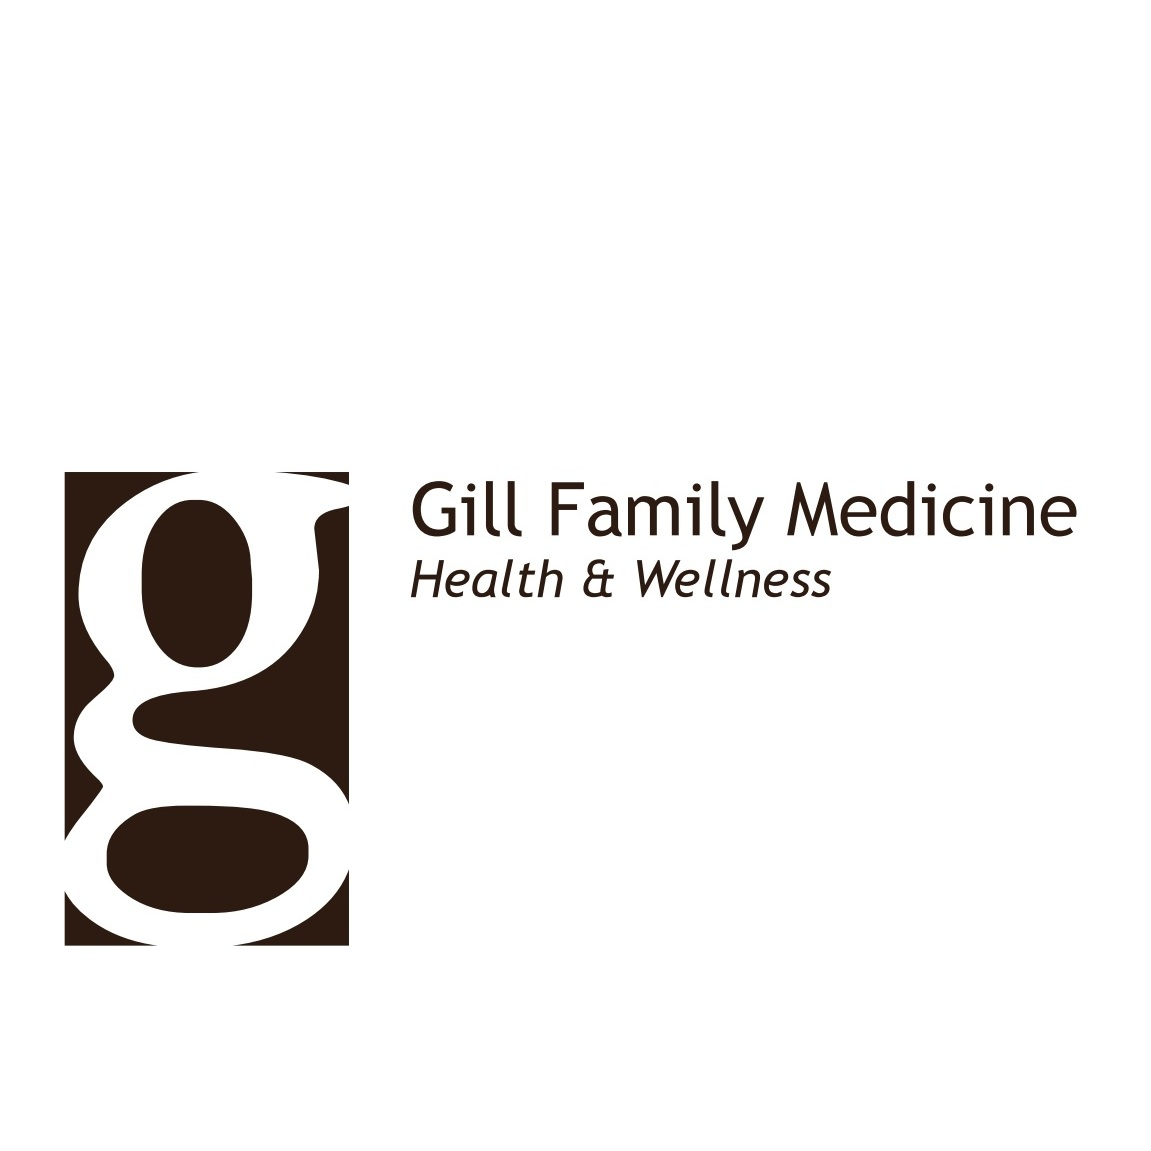 Gill Family Medicine